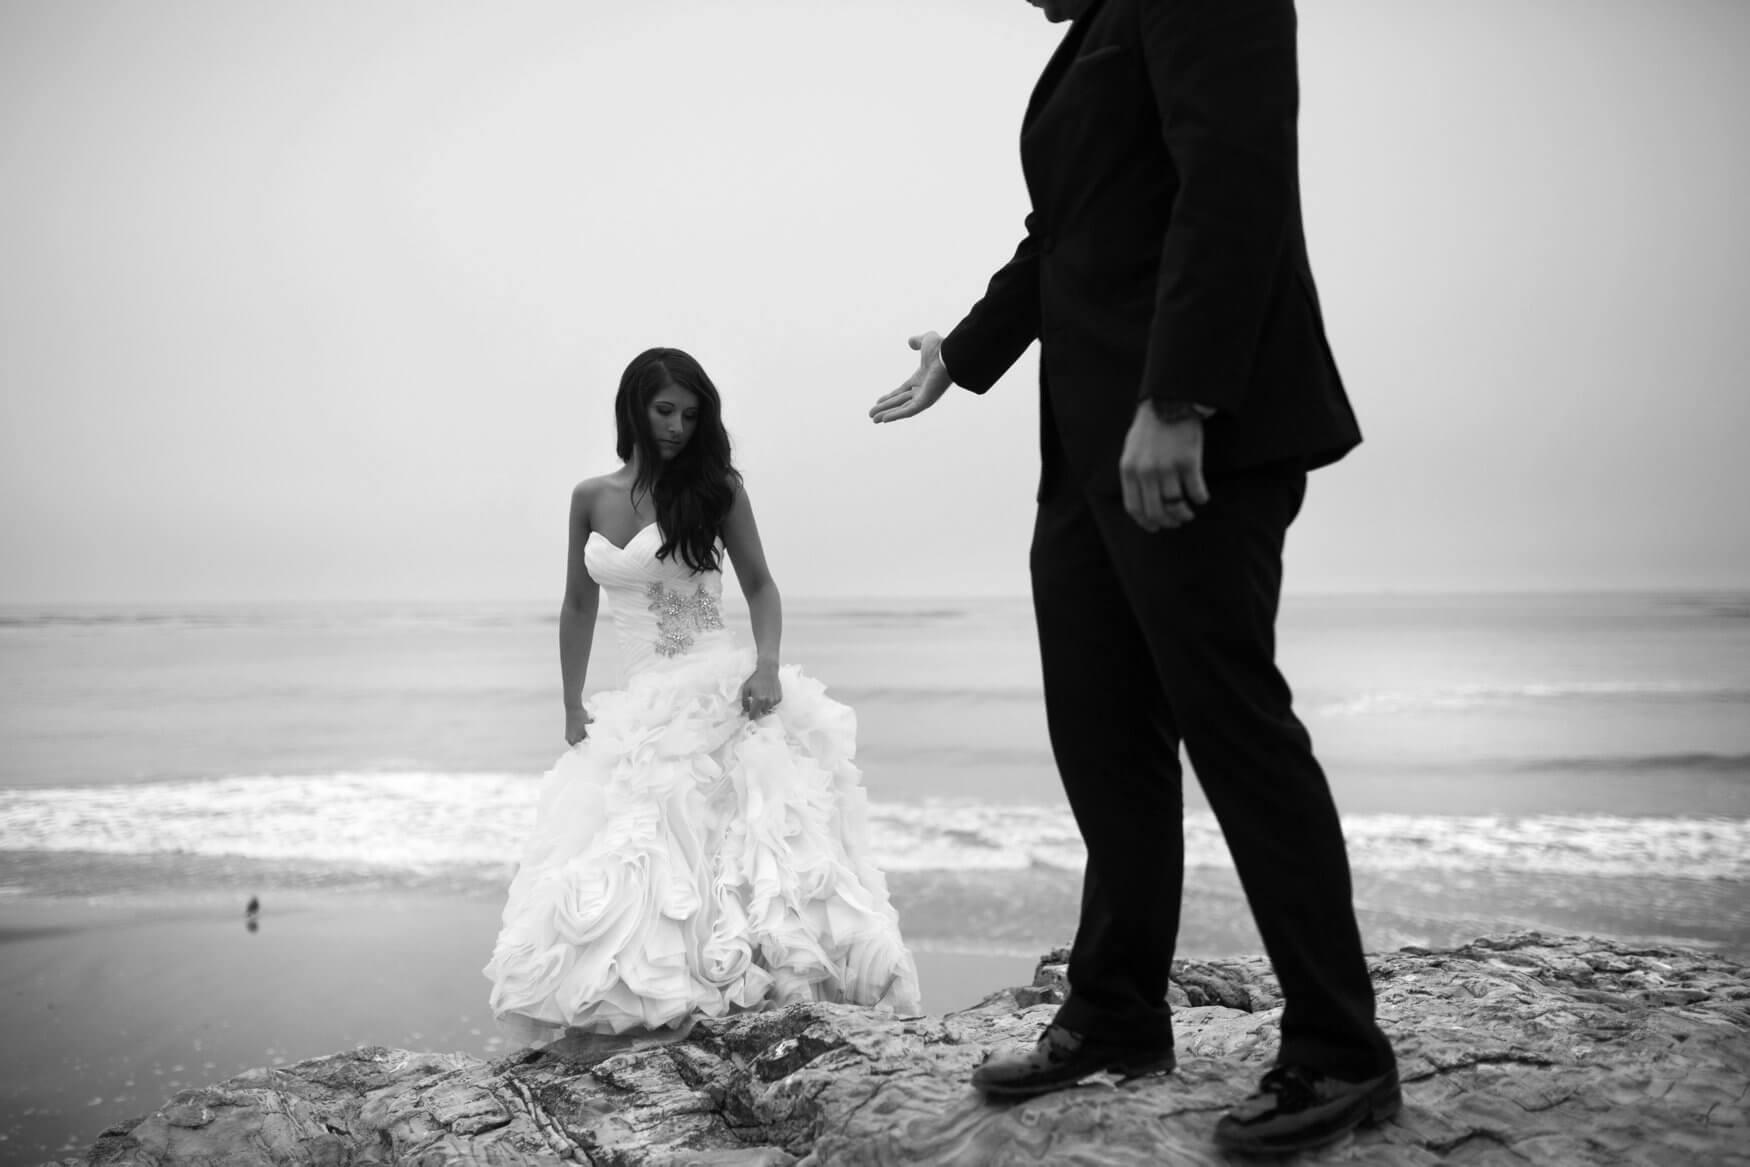 groom helping bride up rocks on Lake Superior | Minnesota wedding photographer Studio KH wedding dress details | wedding blog | Sixpence Events 70 Ways to Photograph Your Wedding Dress.jpg